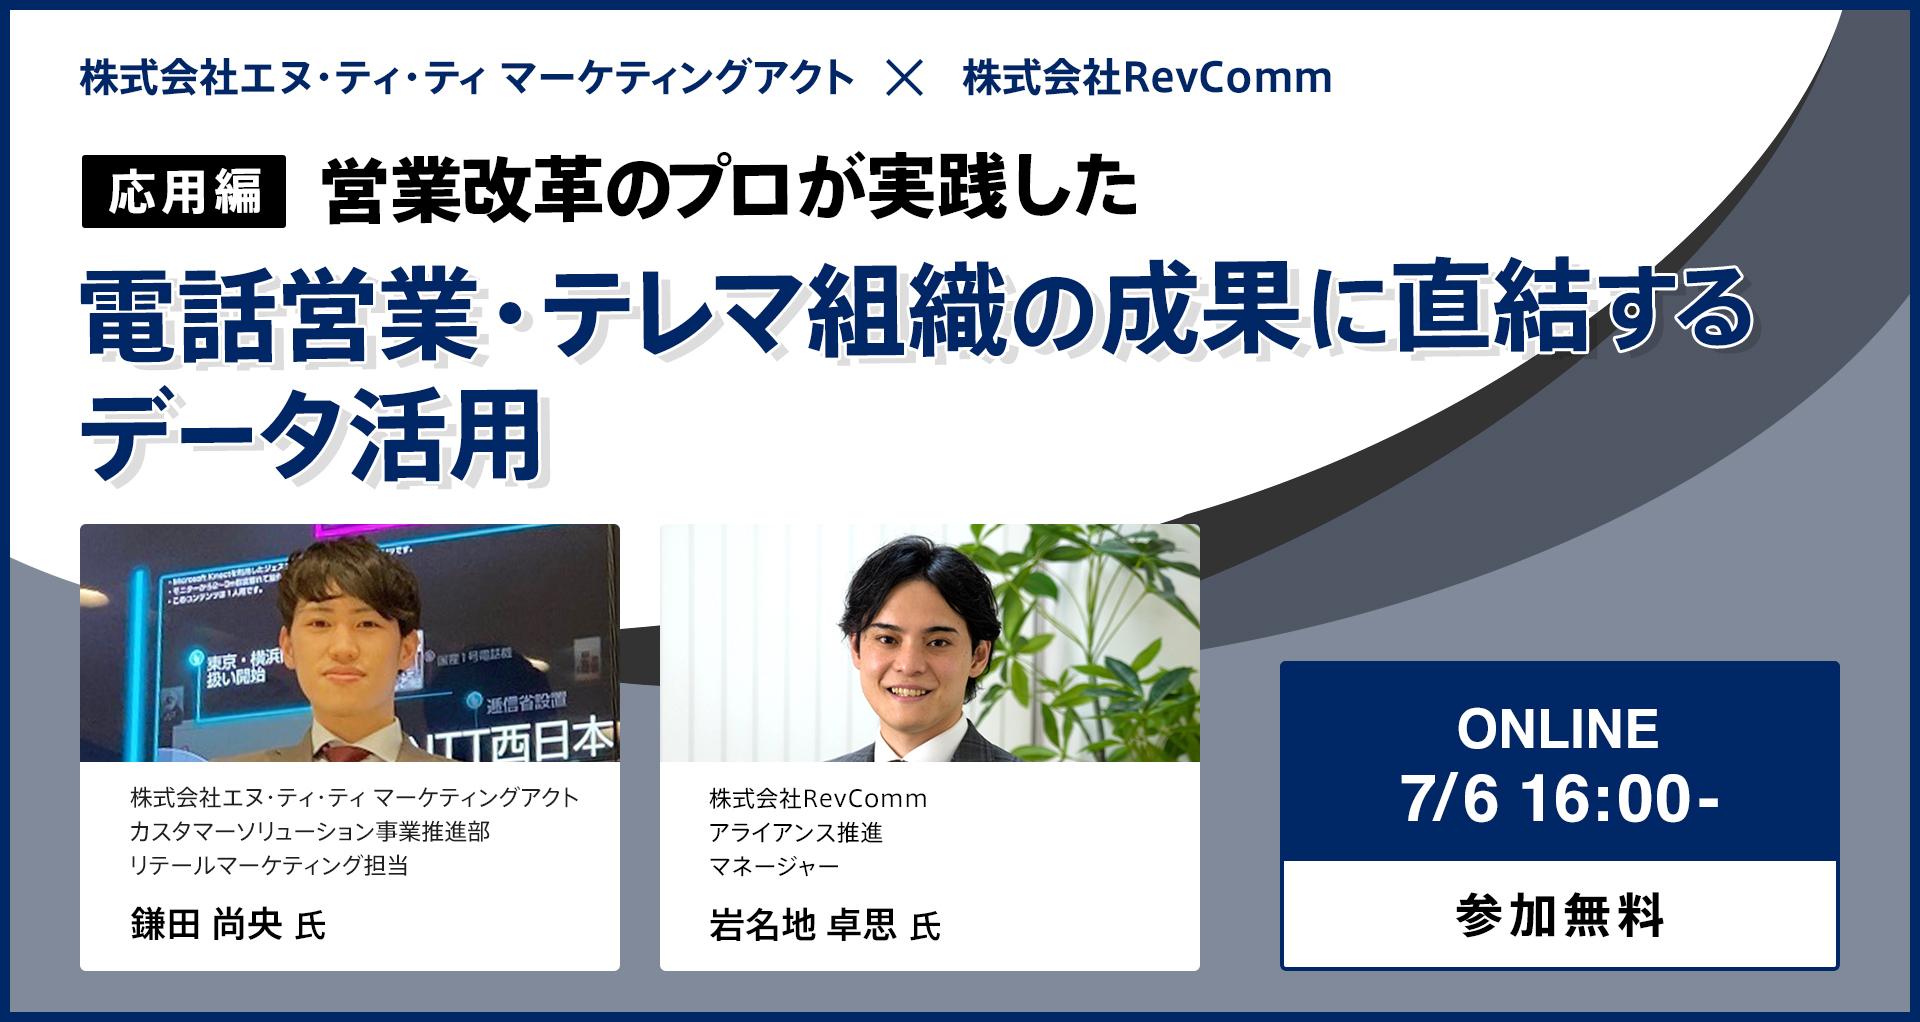 mail_banner15-2_繝ュ繧ウ繧吶↑縺・jpg